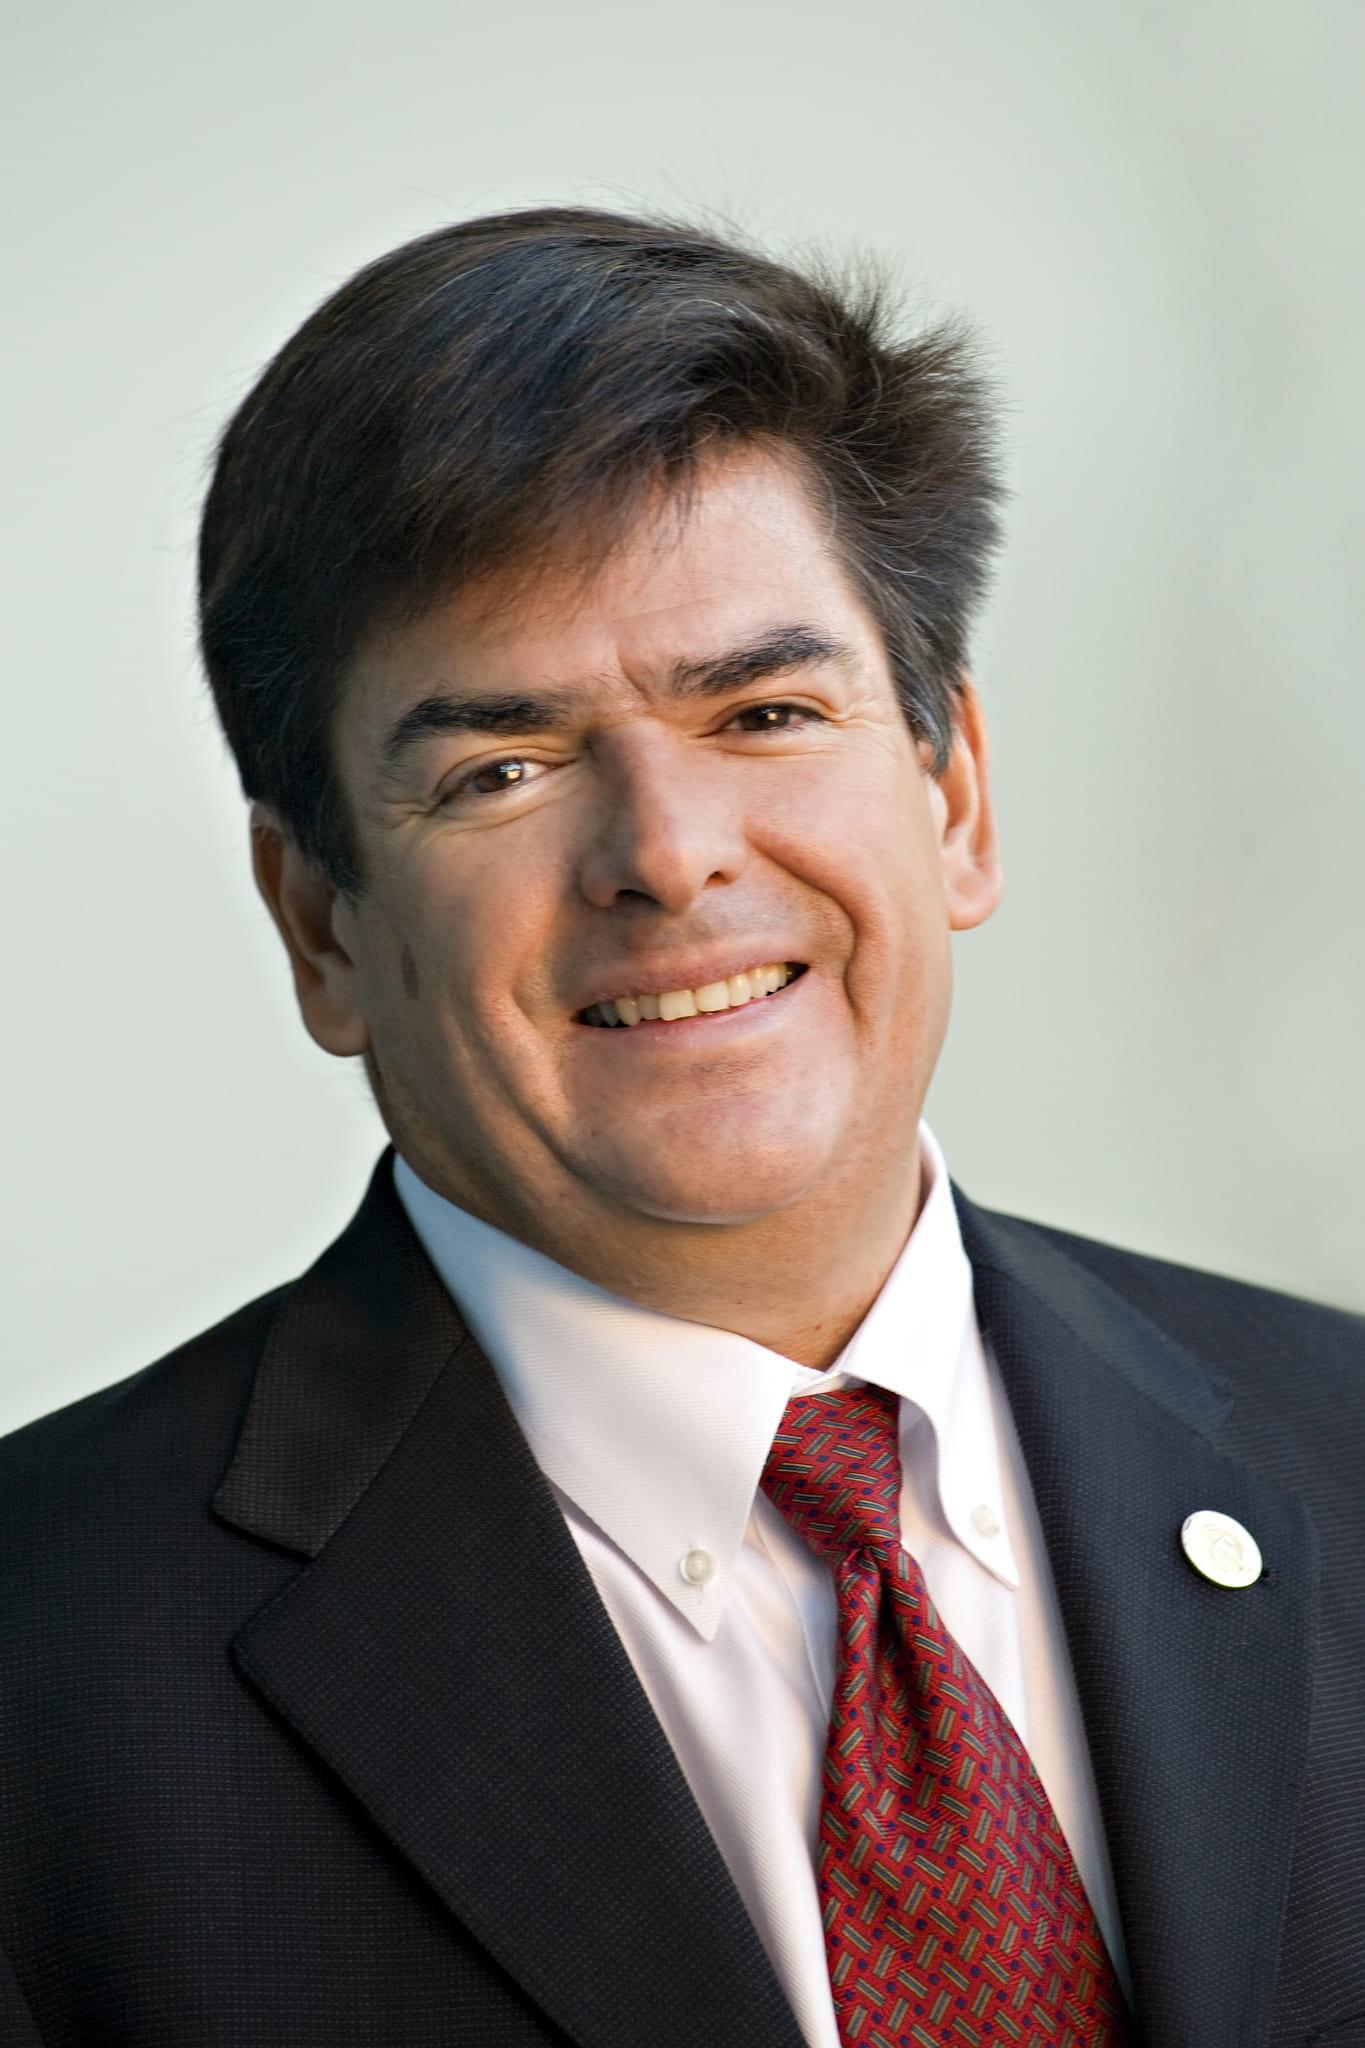 Enrique Lavernia